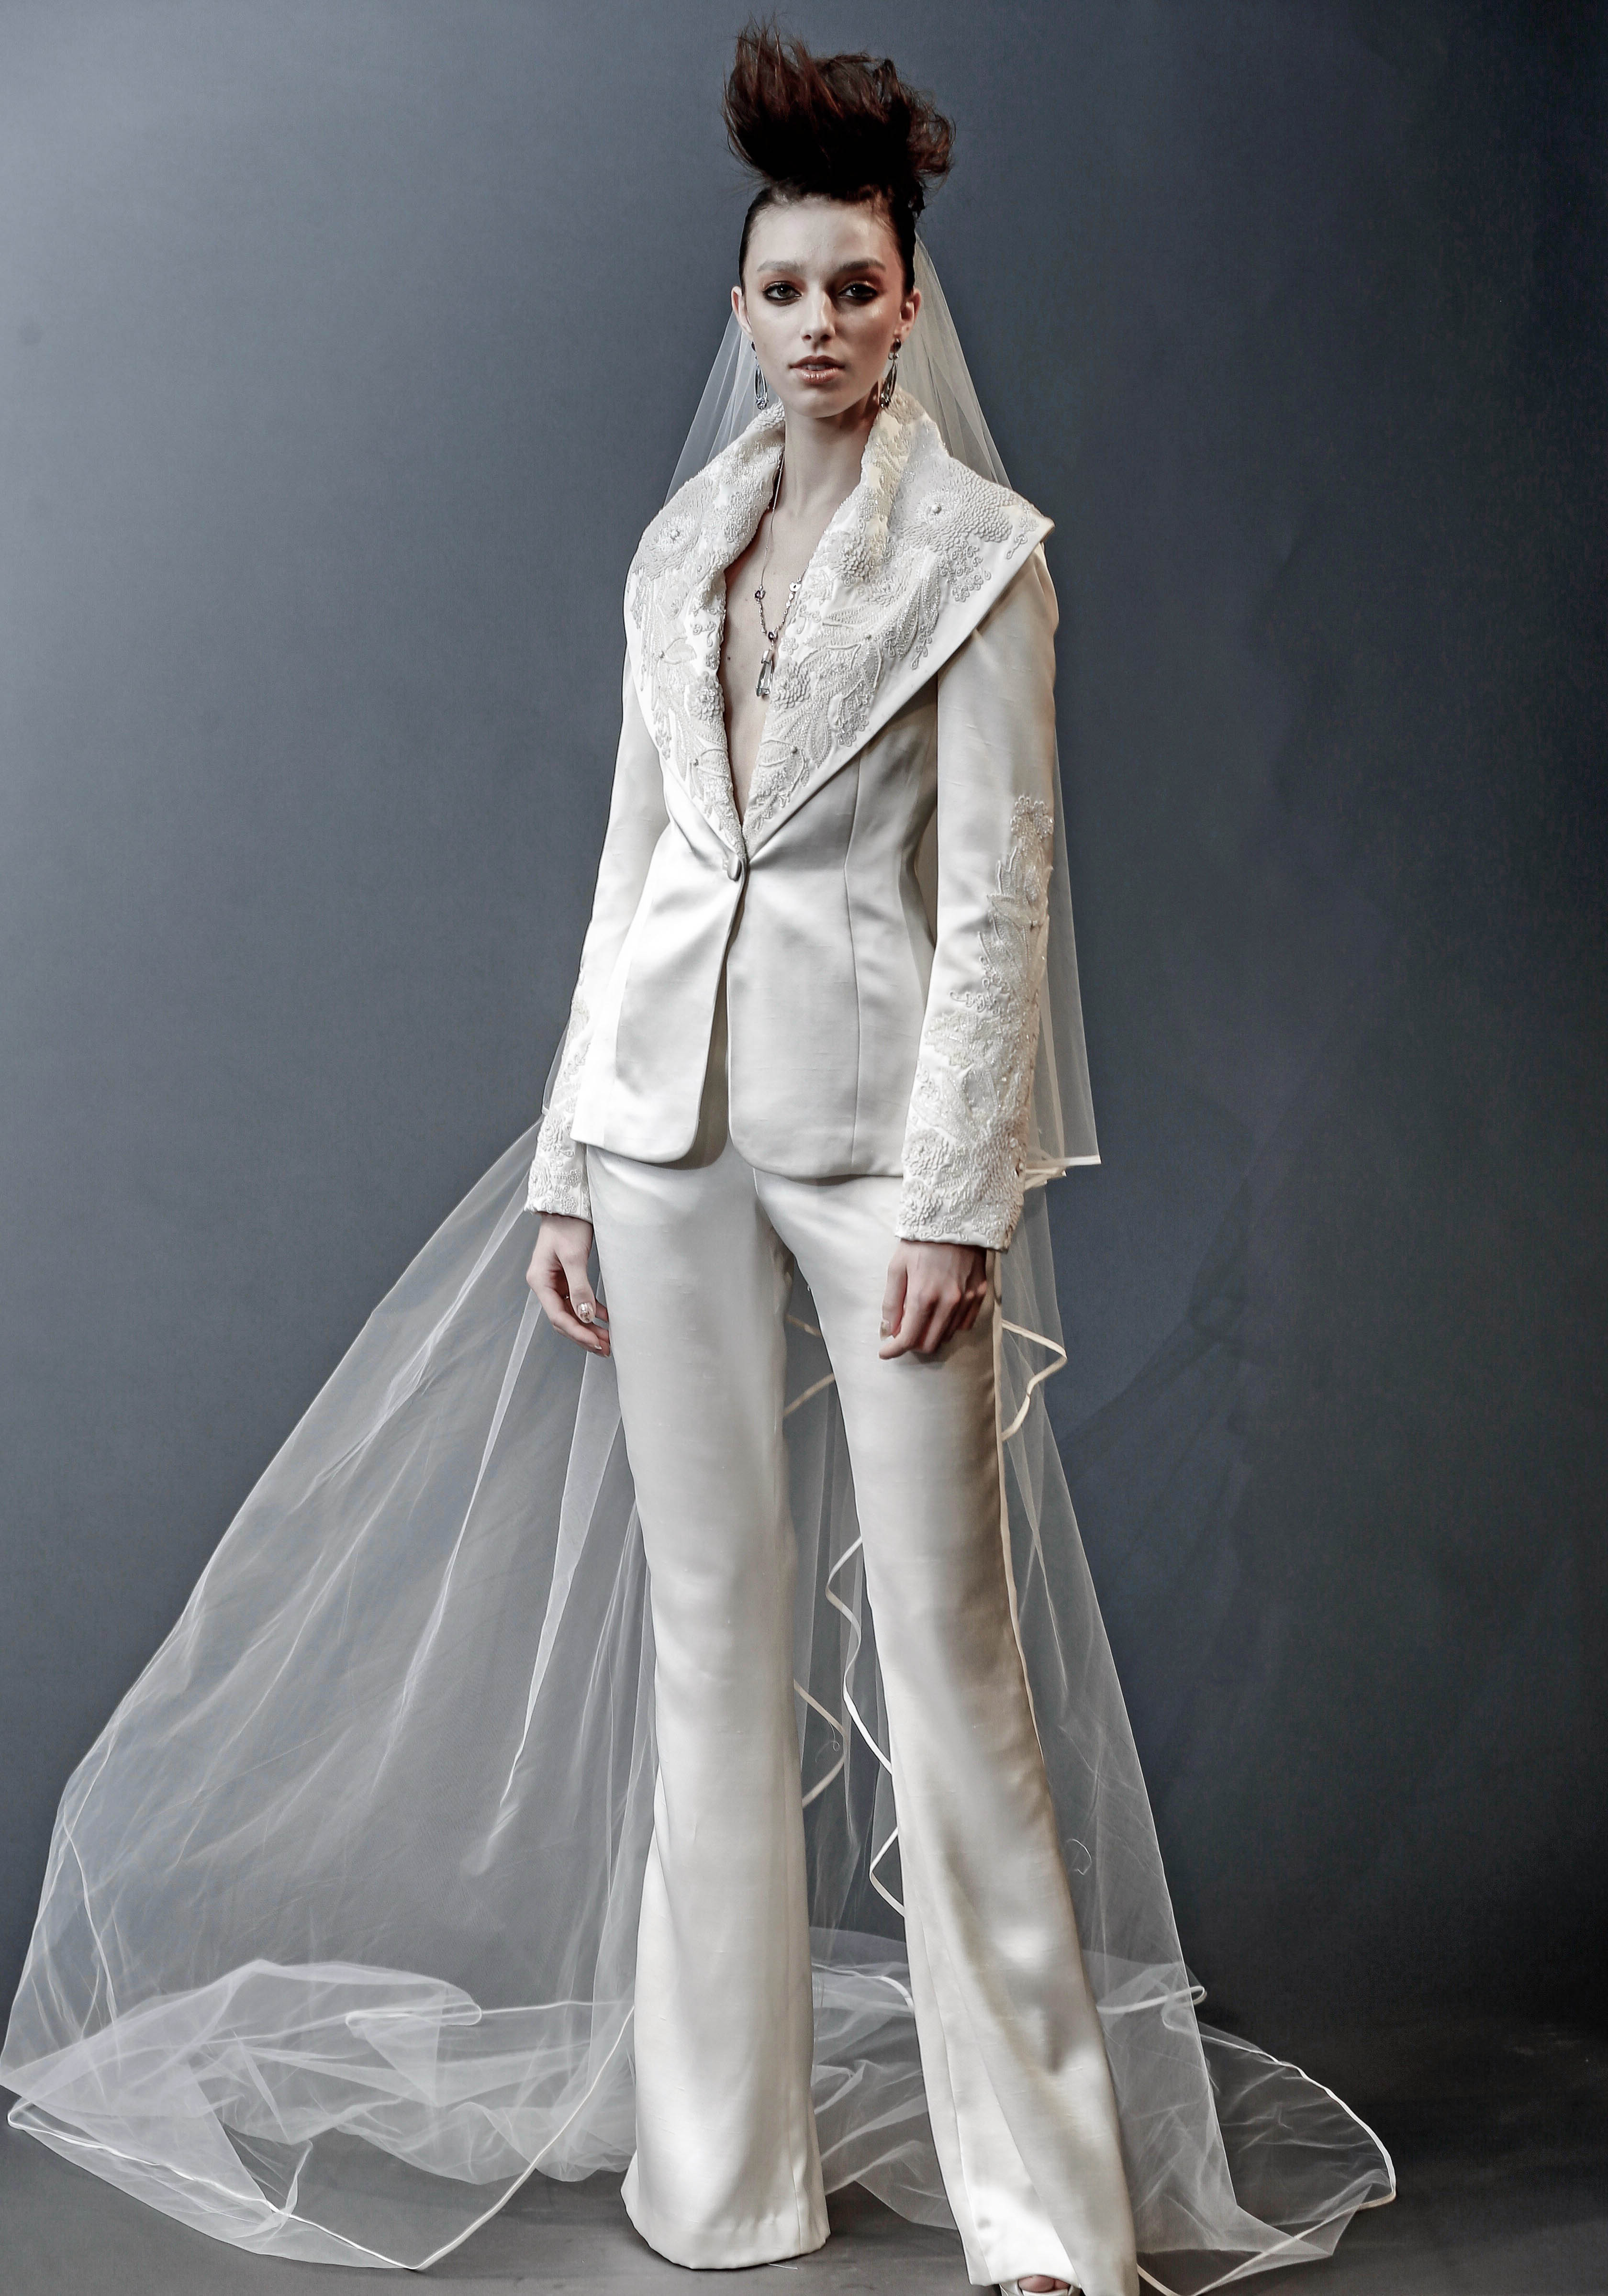 71 Chic Wedding Suits for Brides | Martha Stewart Weddings